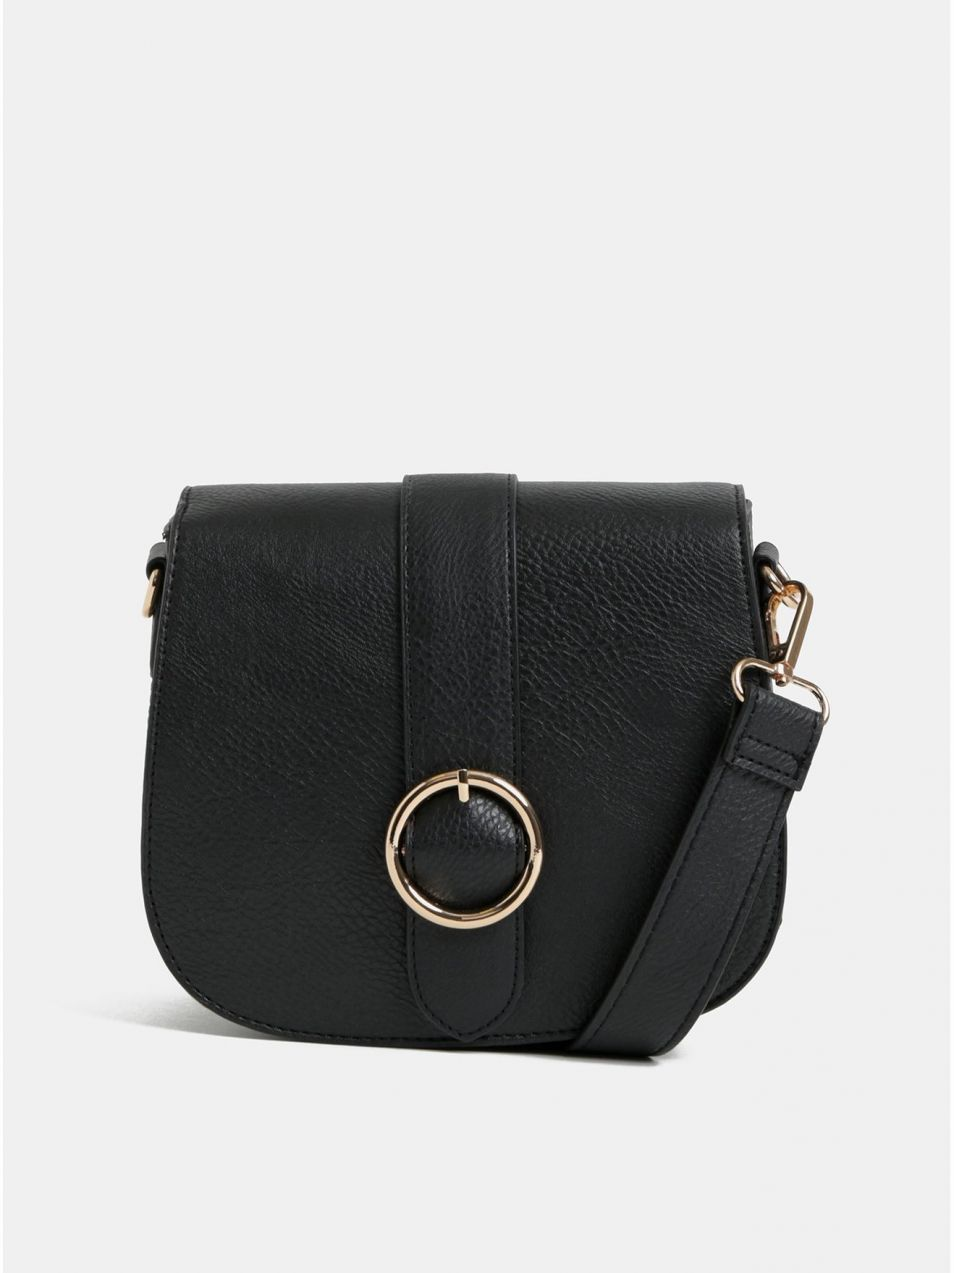 205f052a7d Čierna crossbody kabelka s prackou Dorothy Perkins značky Dorothy ...